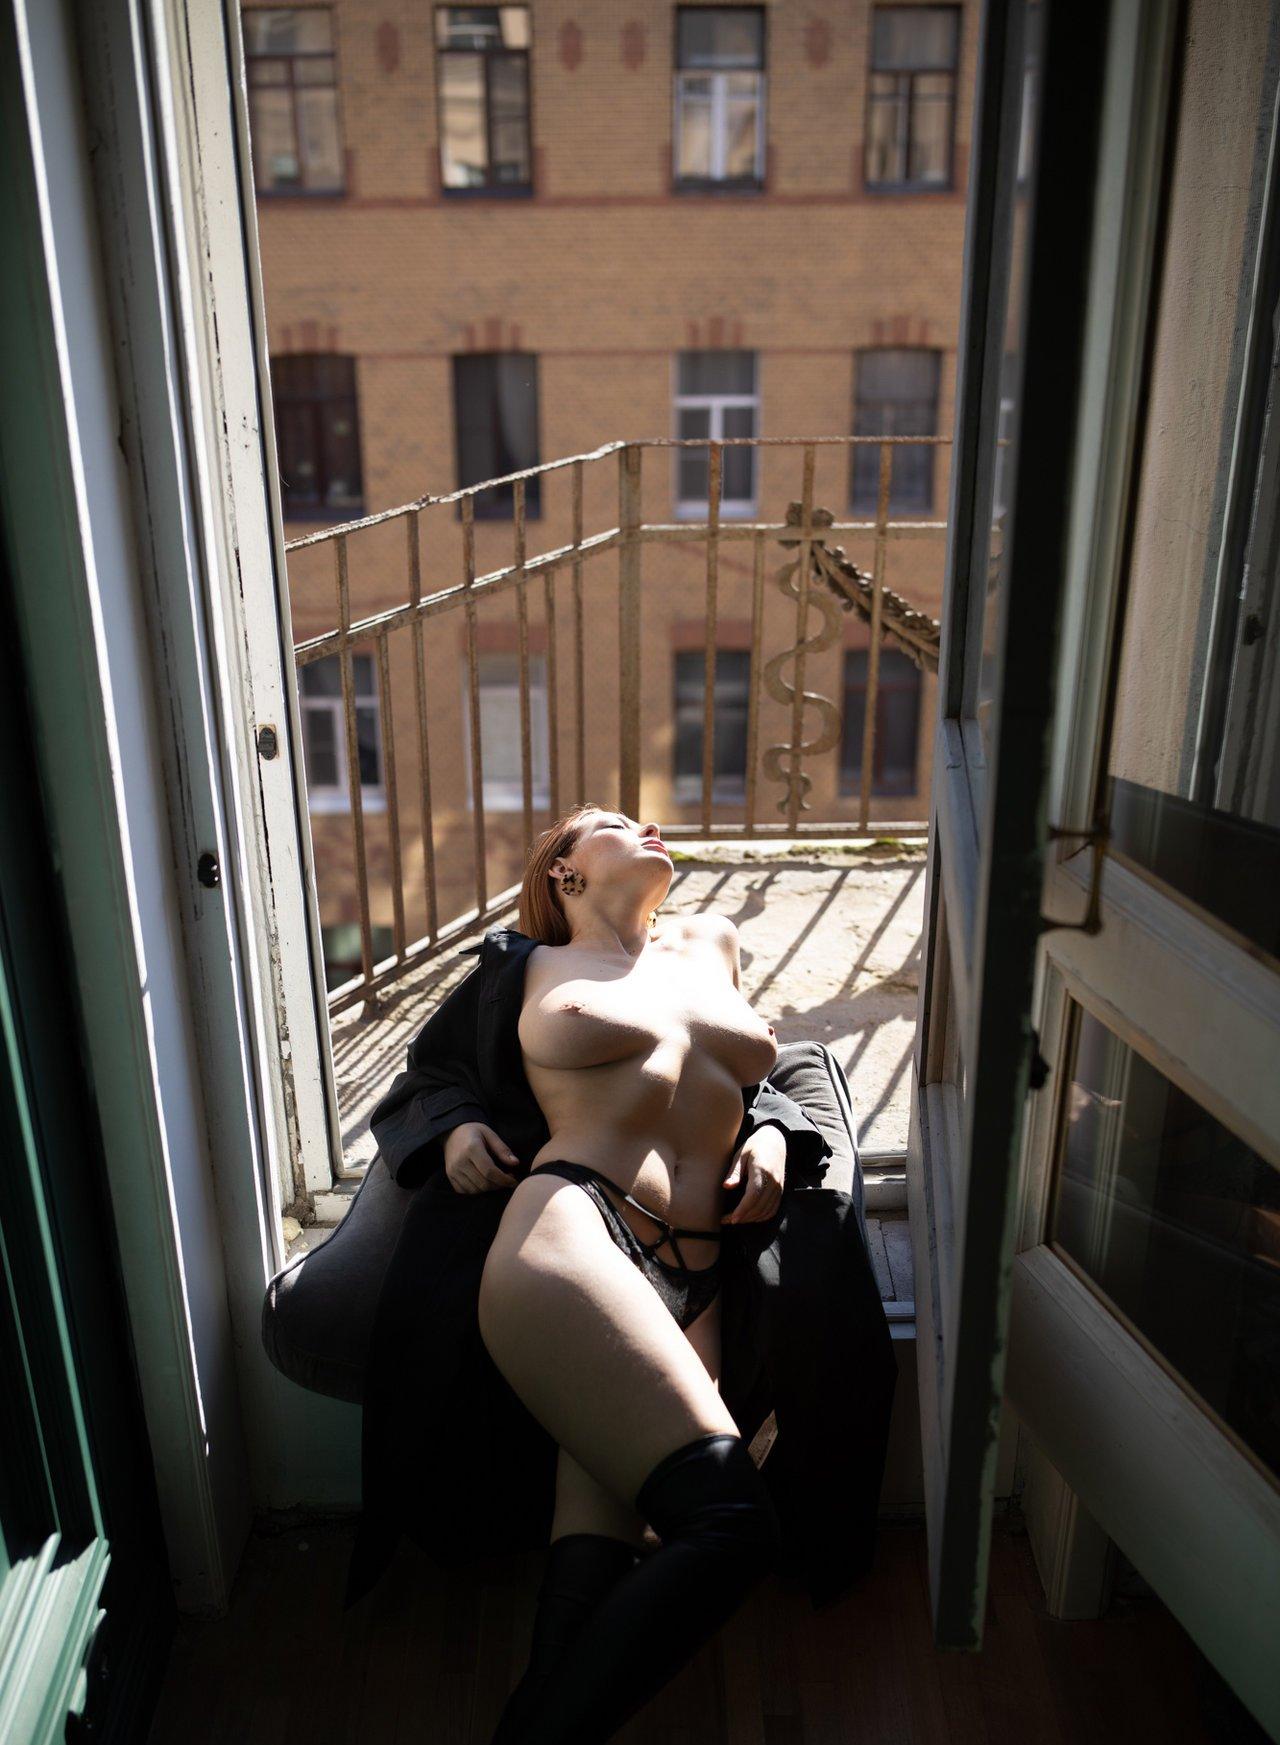 Olga Kobzar Bugs Bunny Gf Nudes Leaks 0014